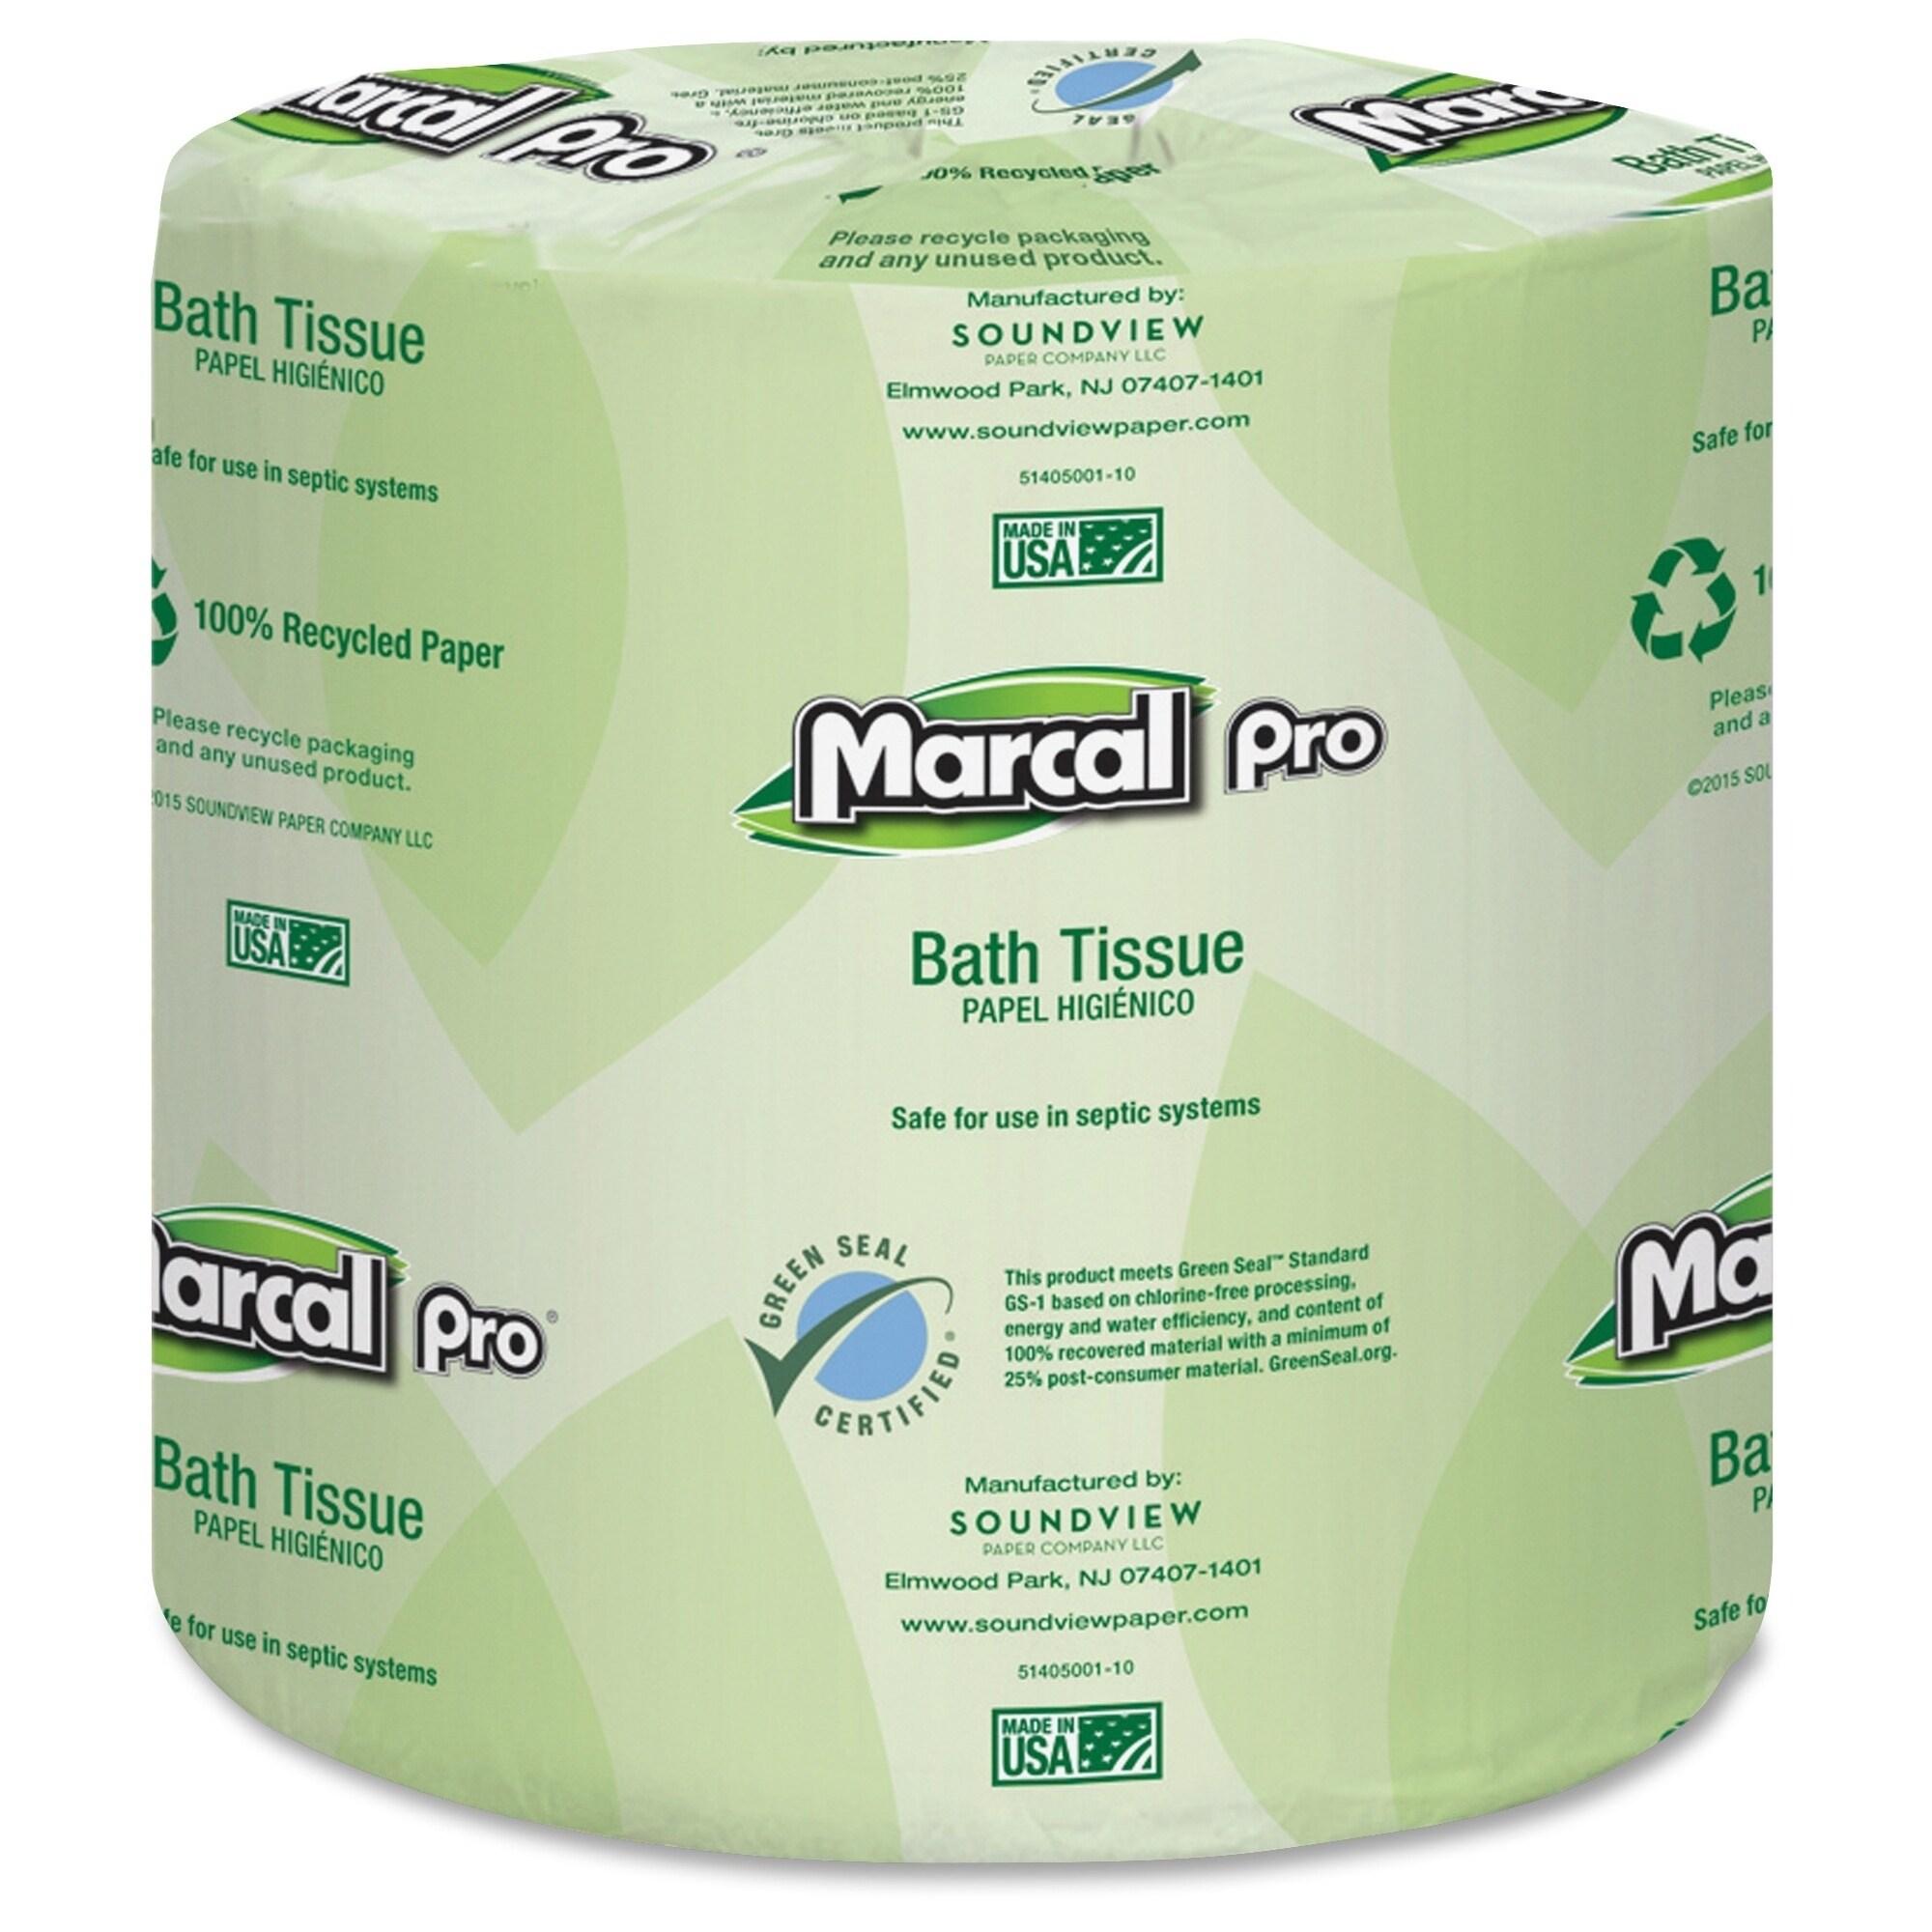 Marcal Pro Two-ply Bath Tissue Pack - (48 PerCarton) (Mas...